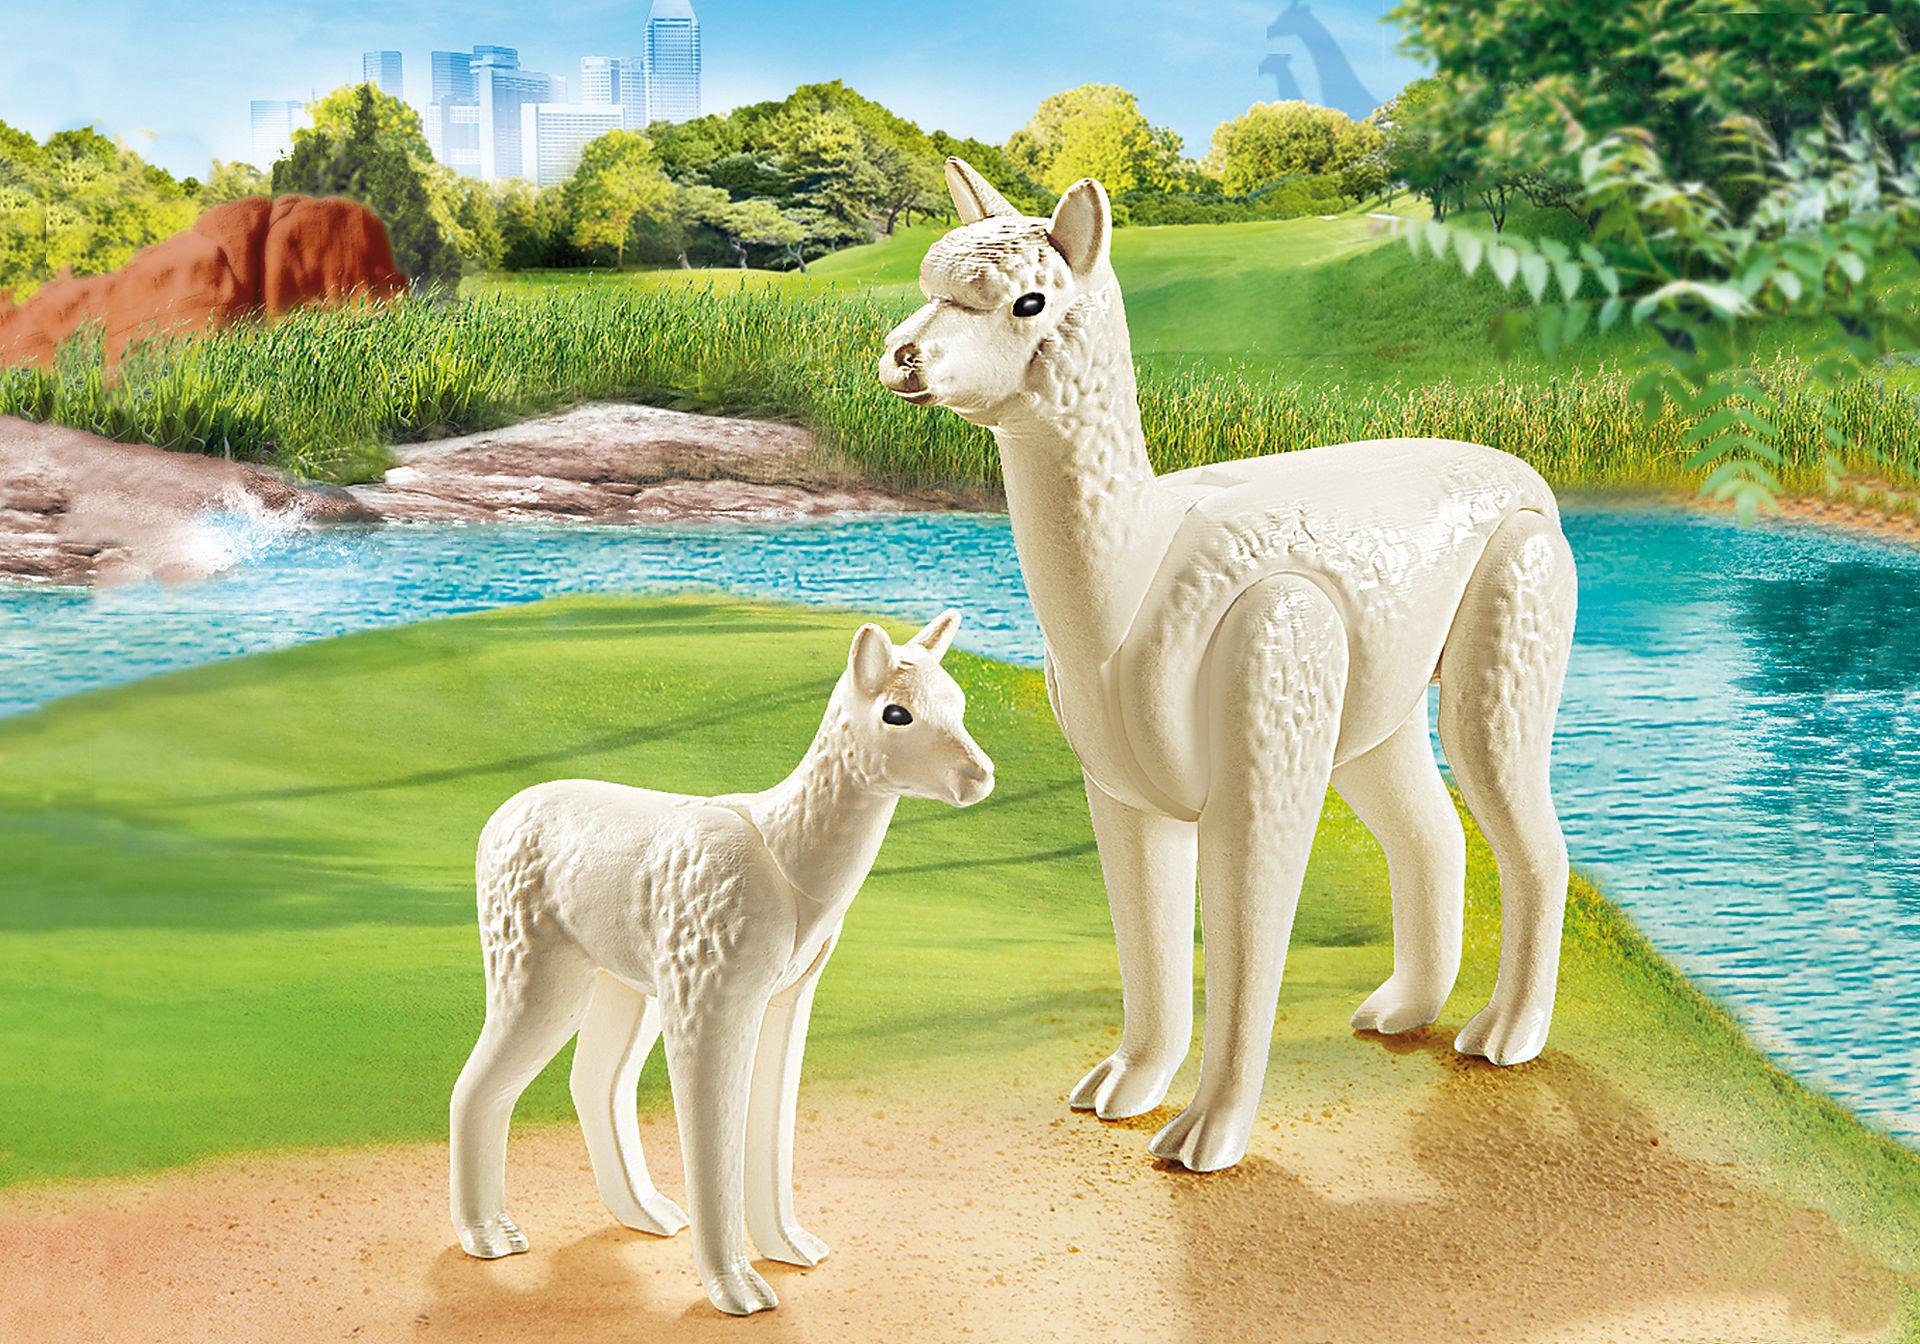 70350 Alpaca with Baby zoom image1